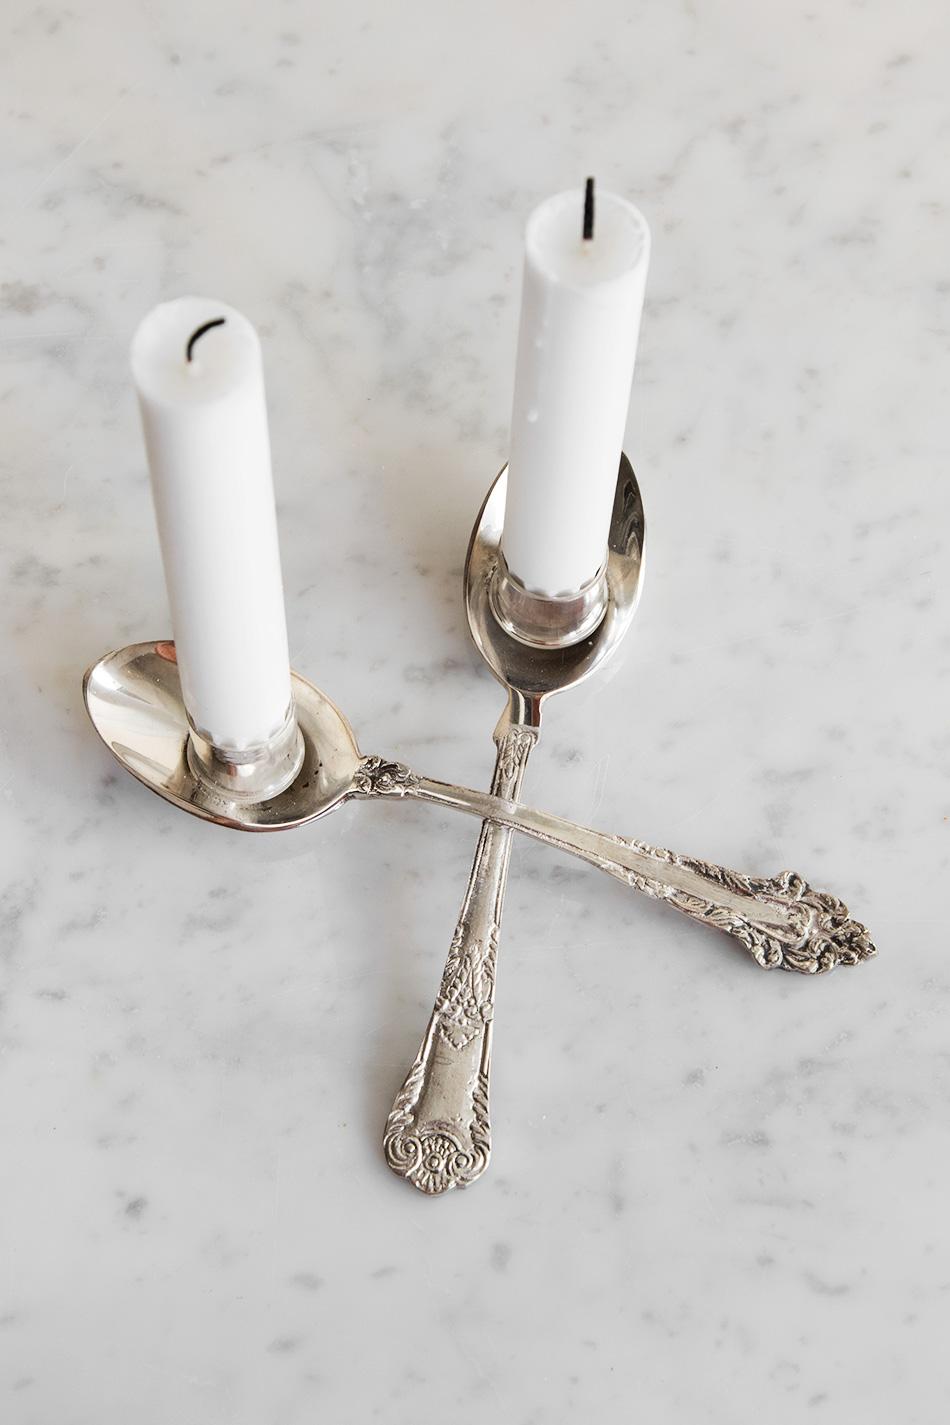 Chehoma Spoons Candle Holder Tamburstore Se